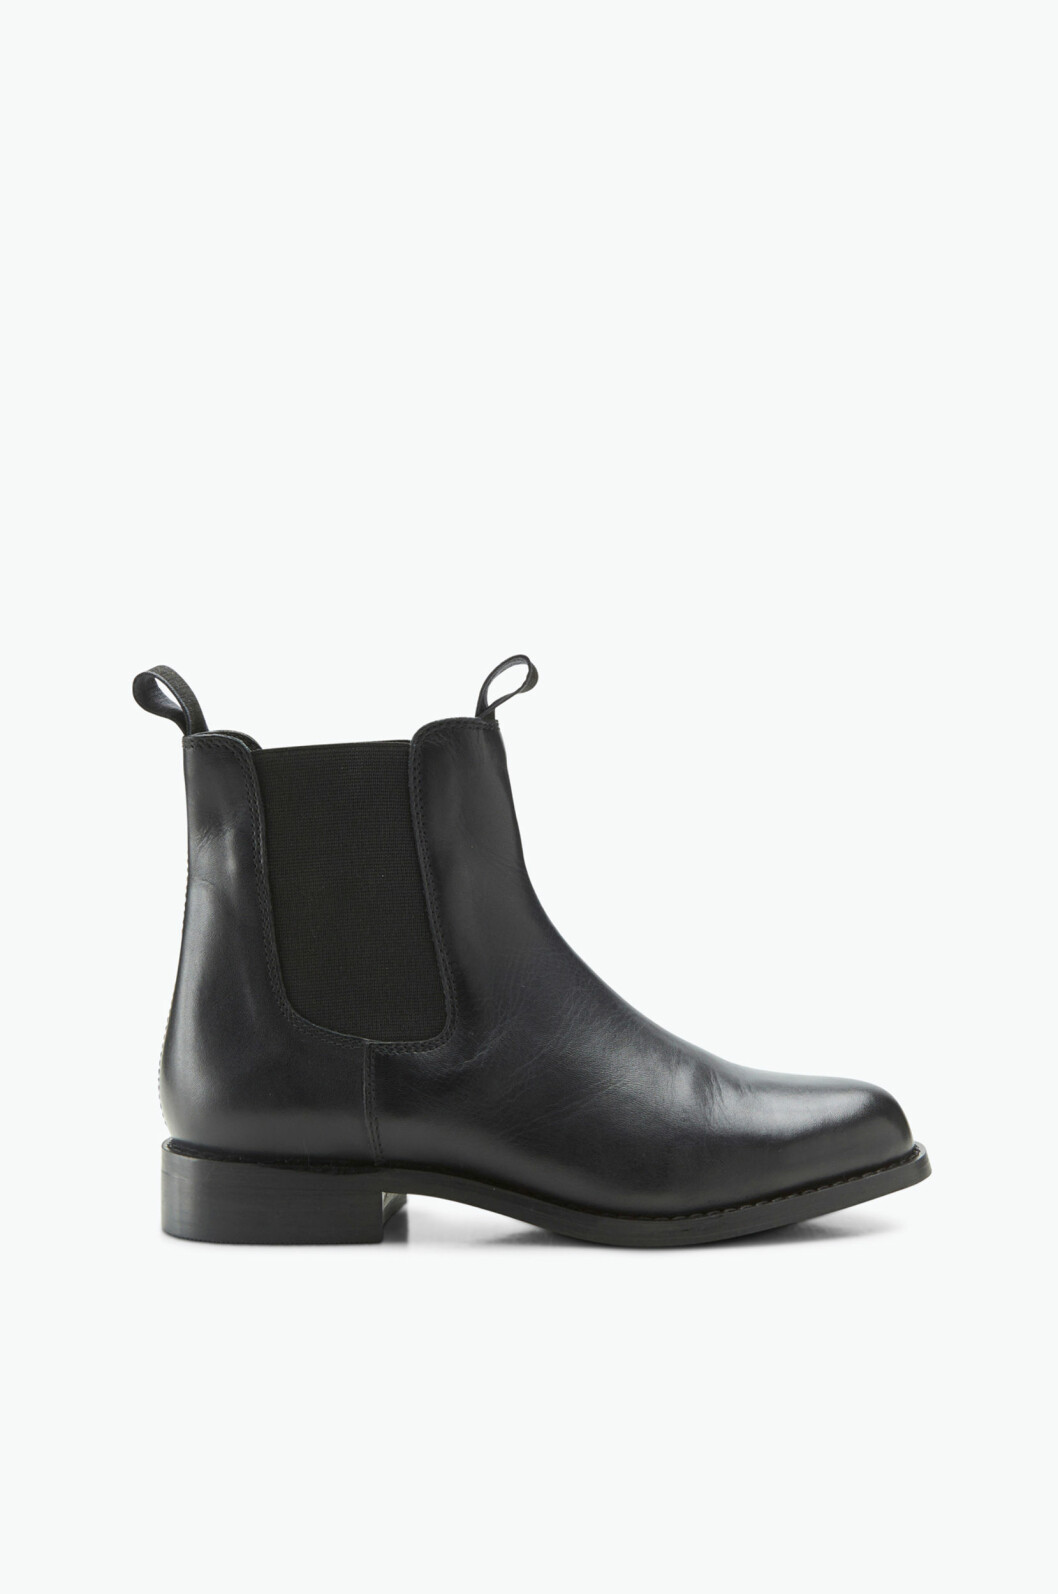 <strong>Boots fra Ellos | kr 1049 | https:</strong>//track.adtraction.com/t/t?a=1068408670&as=1115634940&t=2&tk=1&url=http://www.ellos.no/ellos-shoes/chelseaboots-tea-plain-leat/527559?selArt=606217&pr=0C1B2S3T